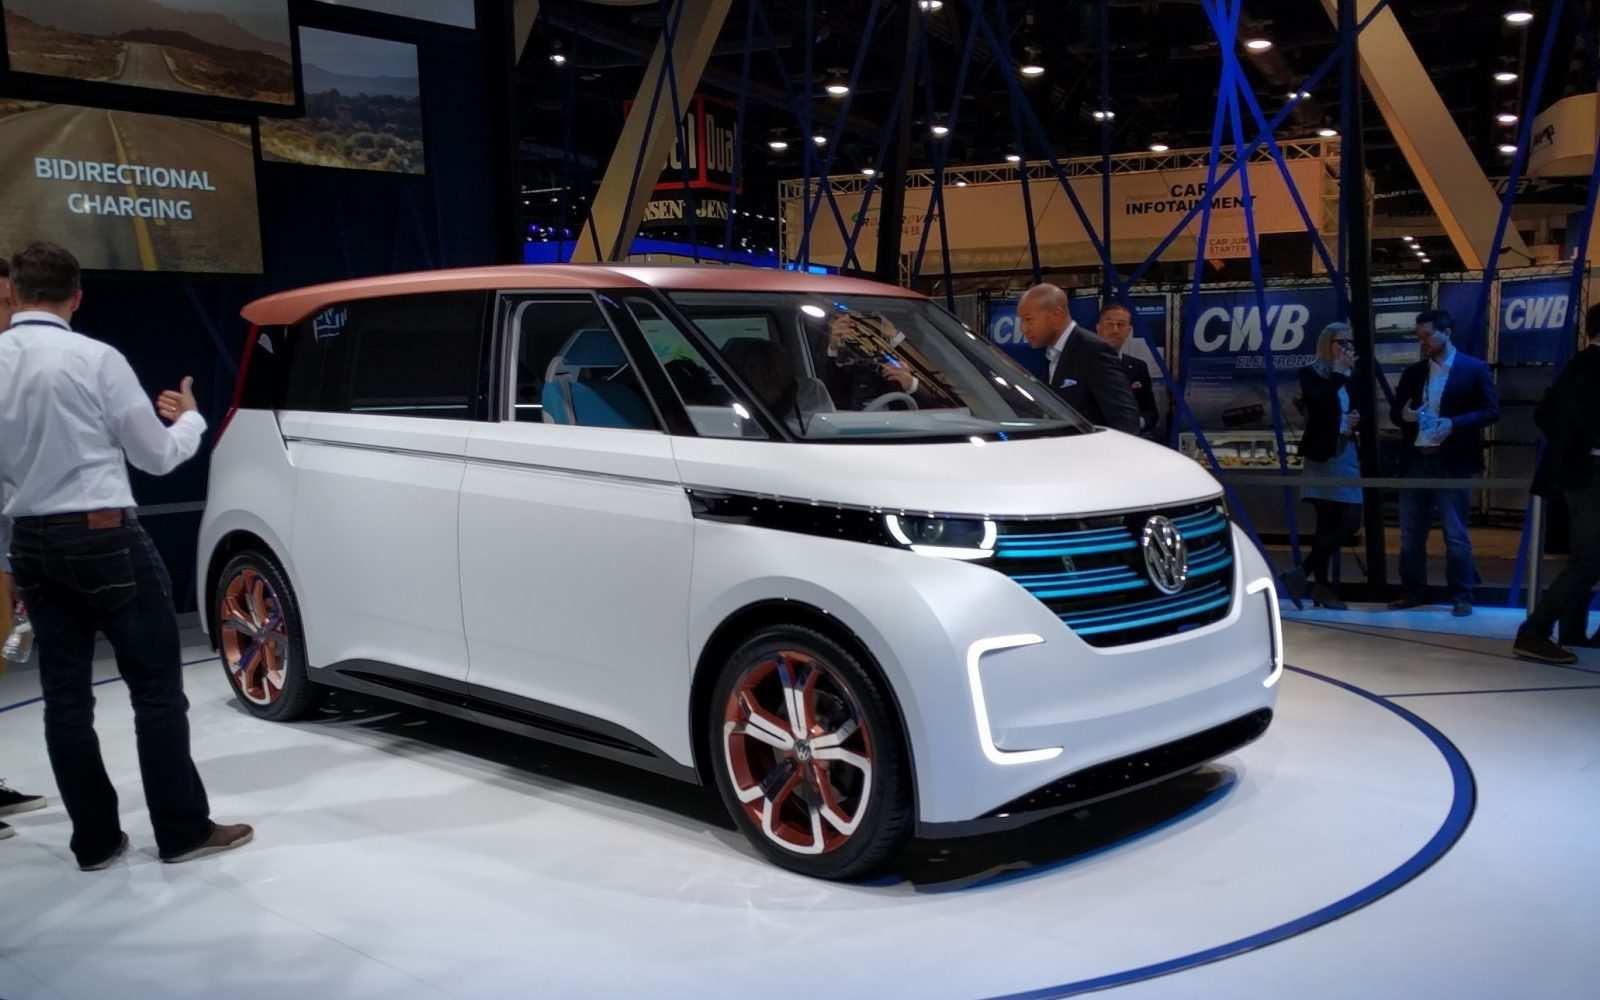 34 New Volkswagen Minibus 2020 Research New by Volkswagen Minibus 2020